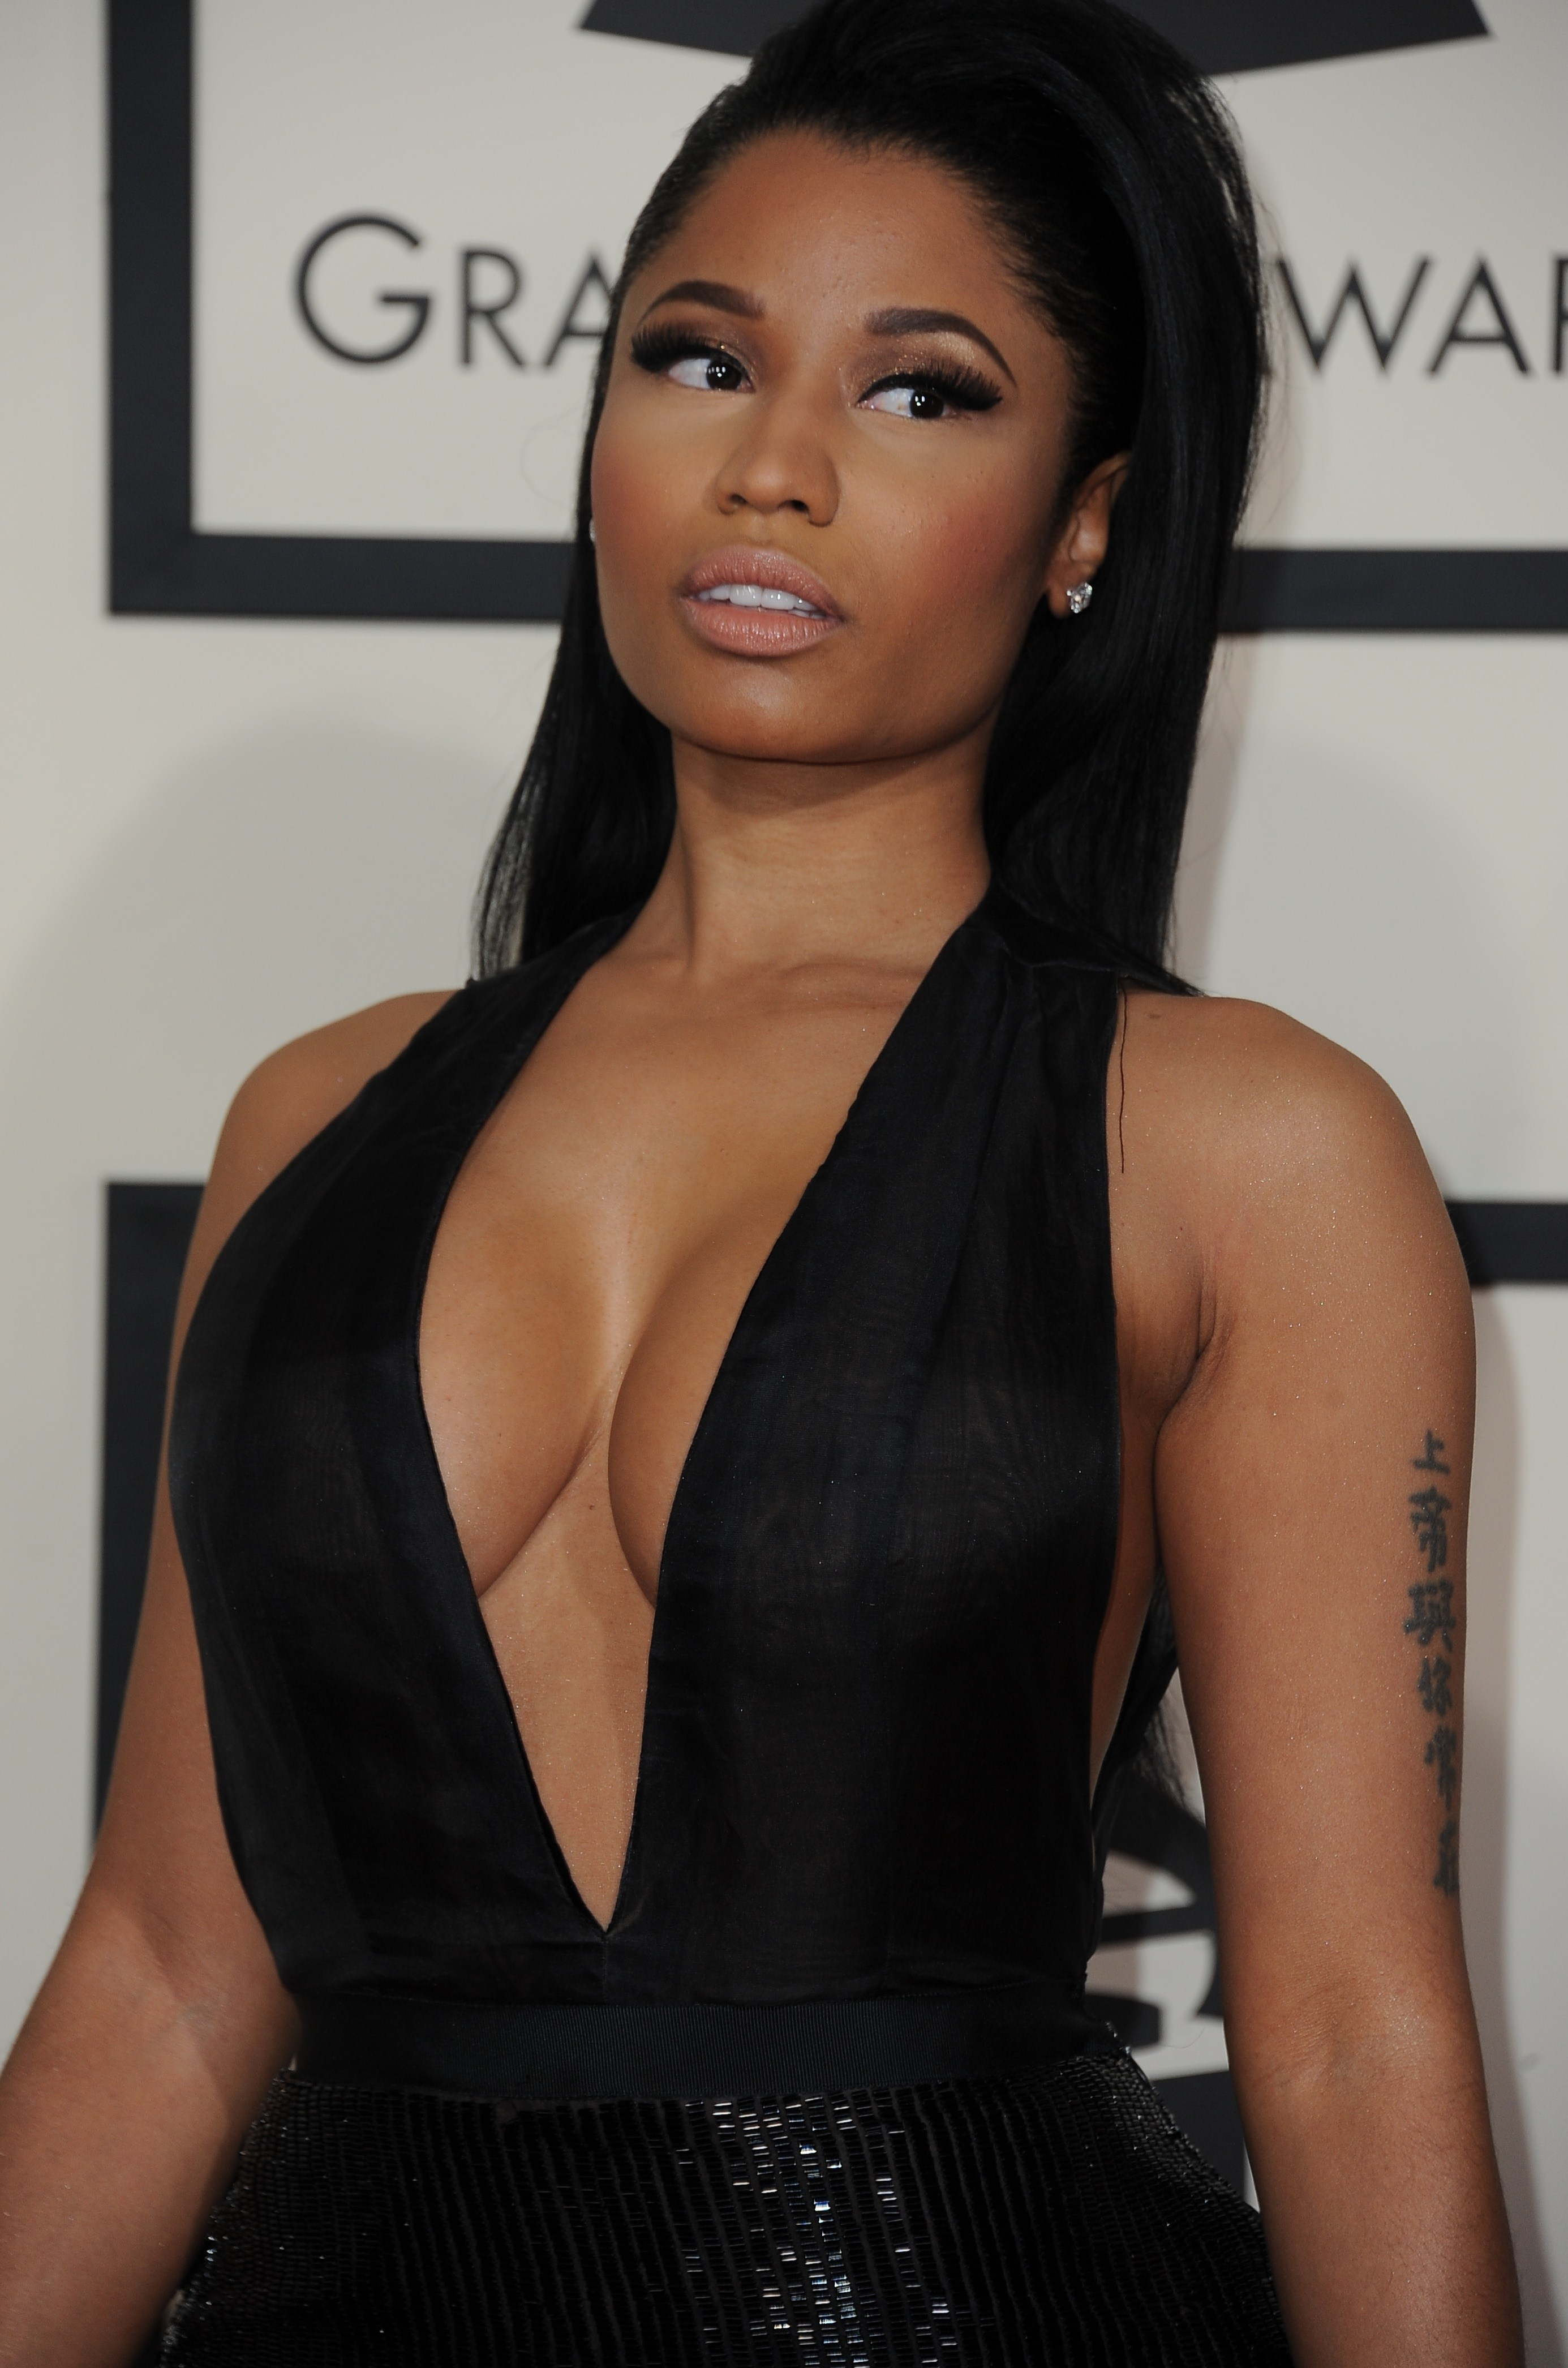 Nicki Minaj See Through To Nipples At The Grammys 12